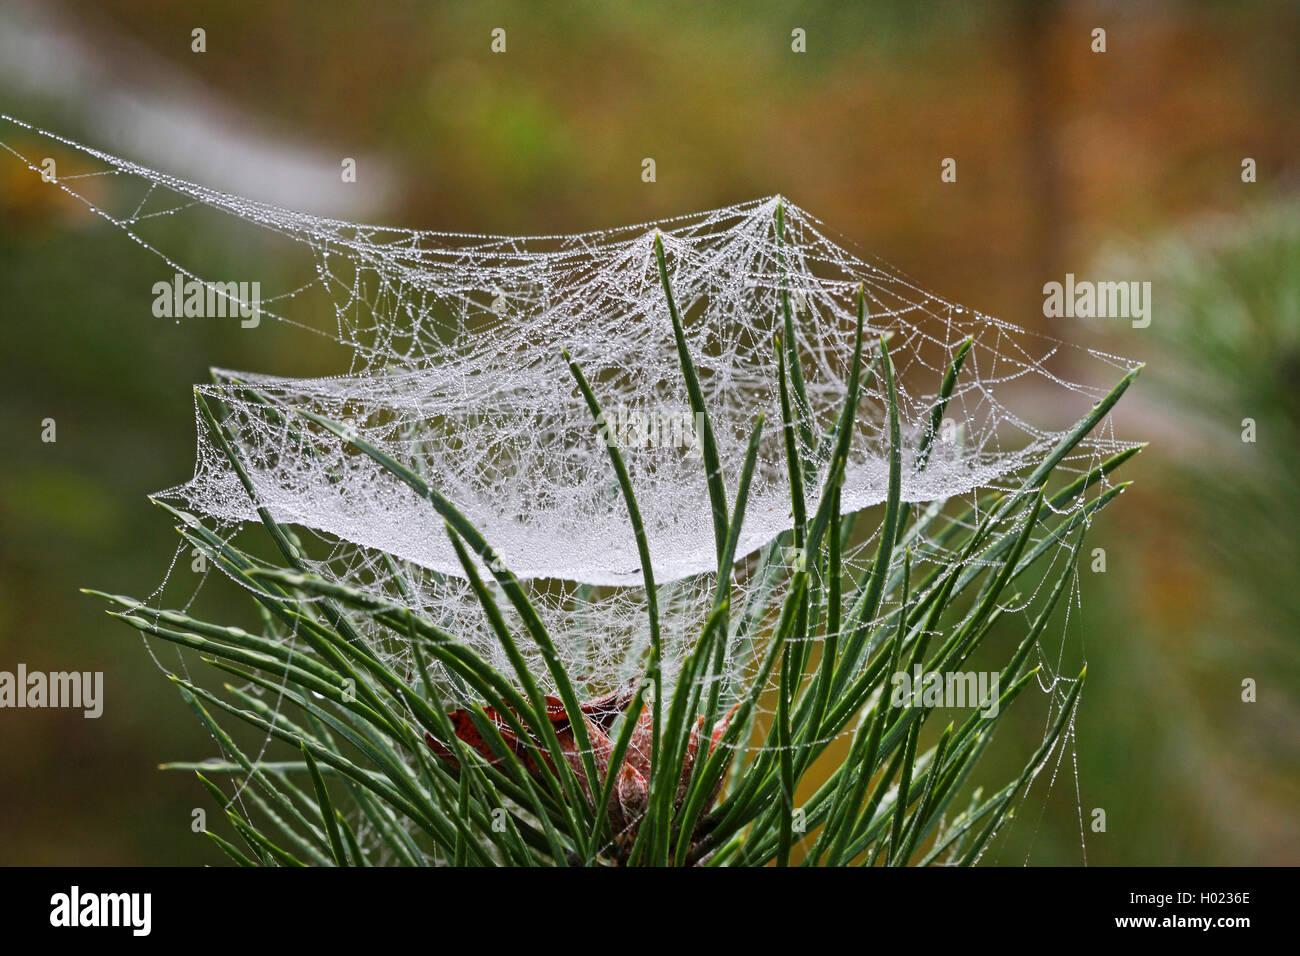 Baldachinspinne, Baldachin-Spinne, Frontinellina frutetorum (Frontinellina frutetorum, Frontinella frutetorum, Linyphia Stock Photo